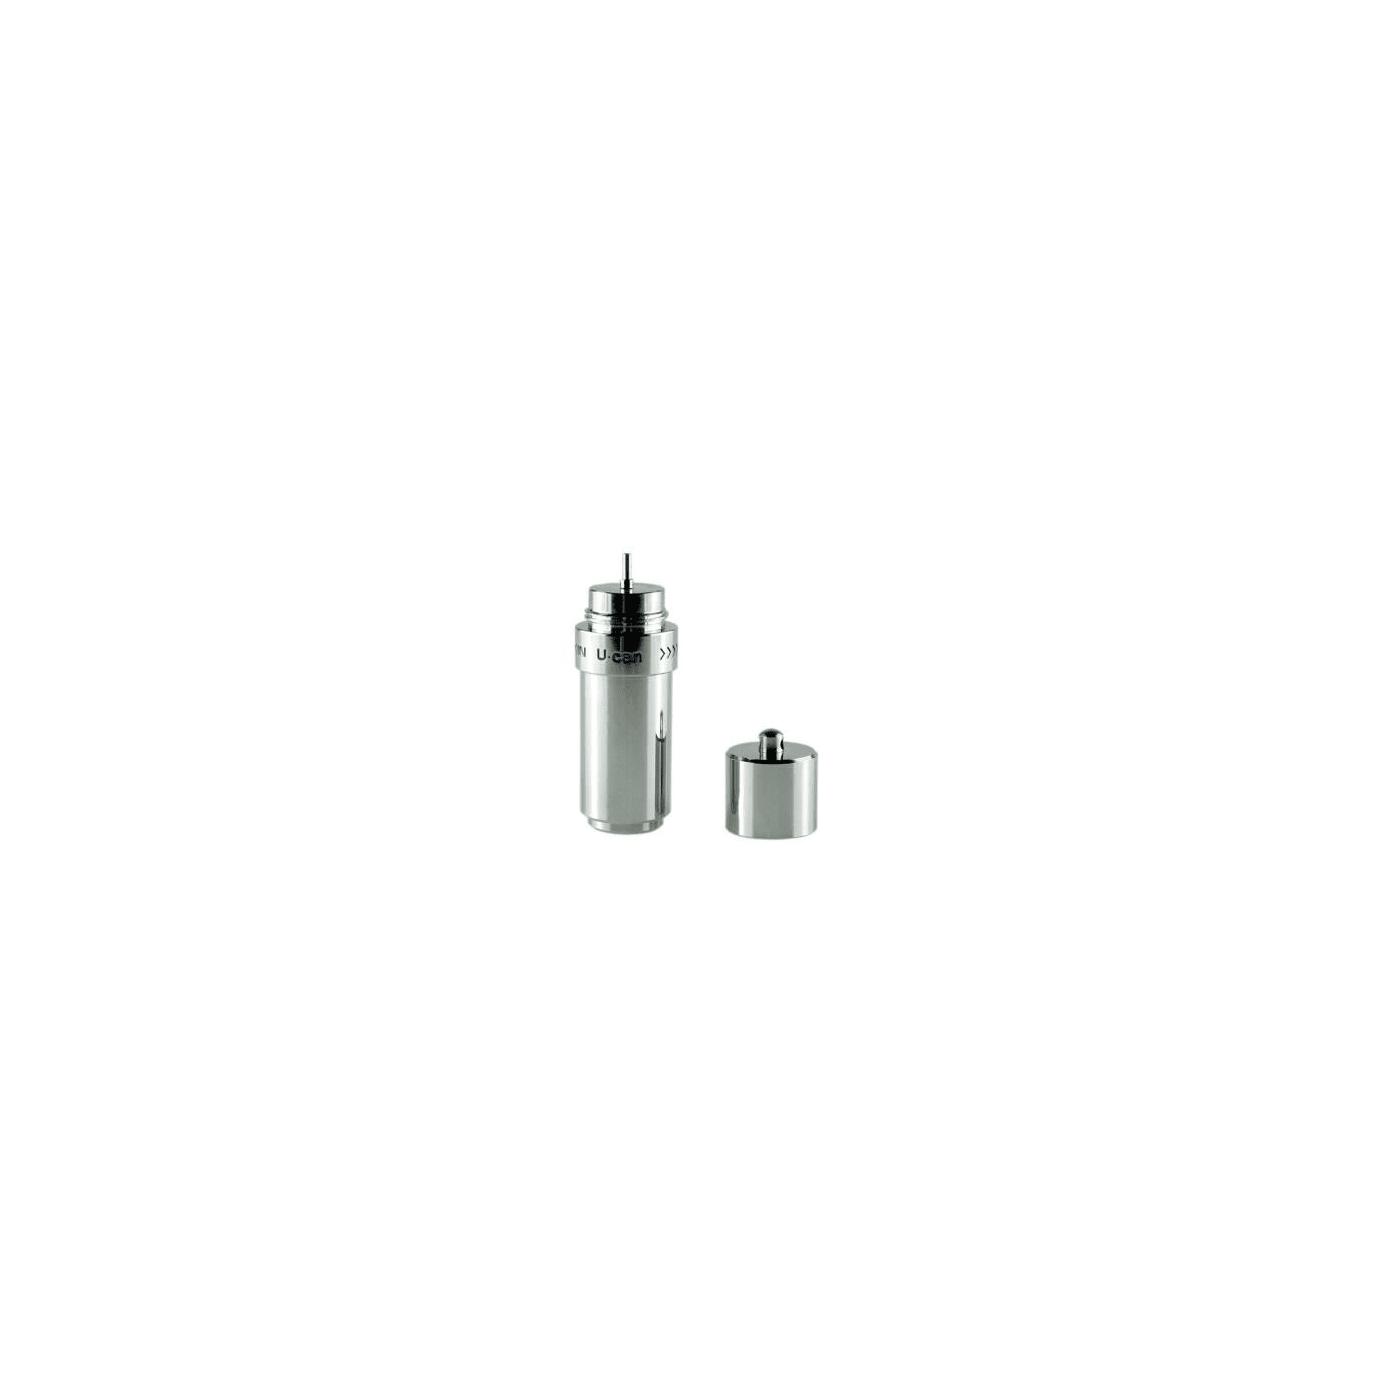 Innokin U-can Juice Dispenser 10mL - Stainless